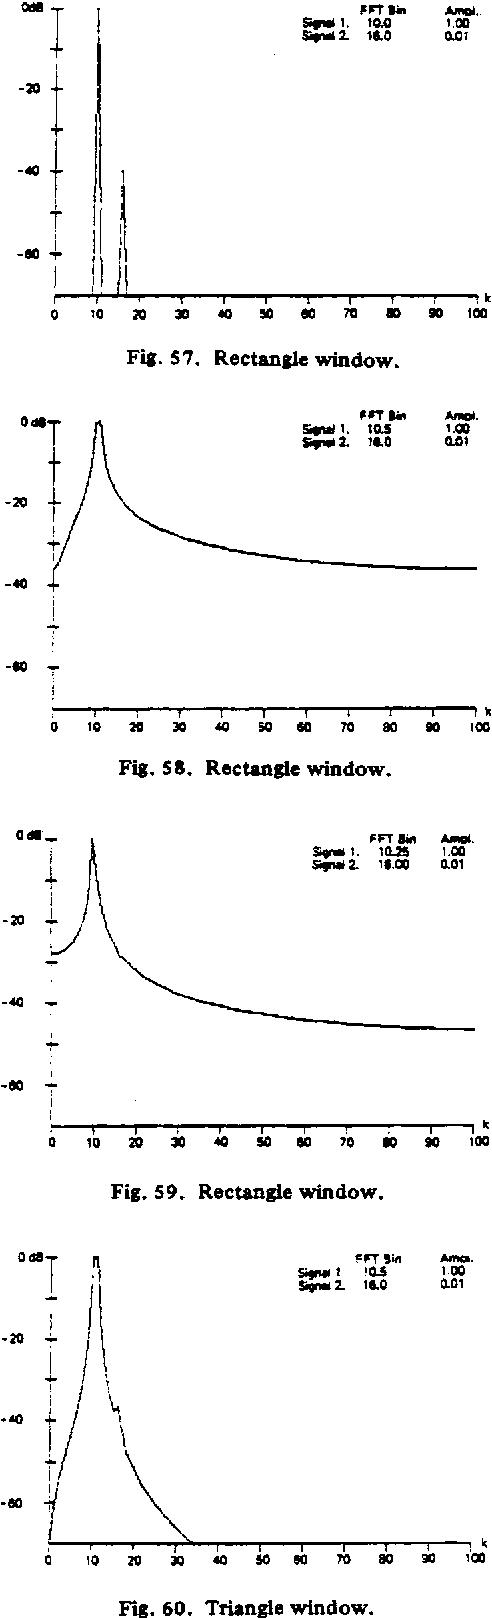 figure 59